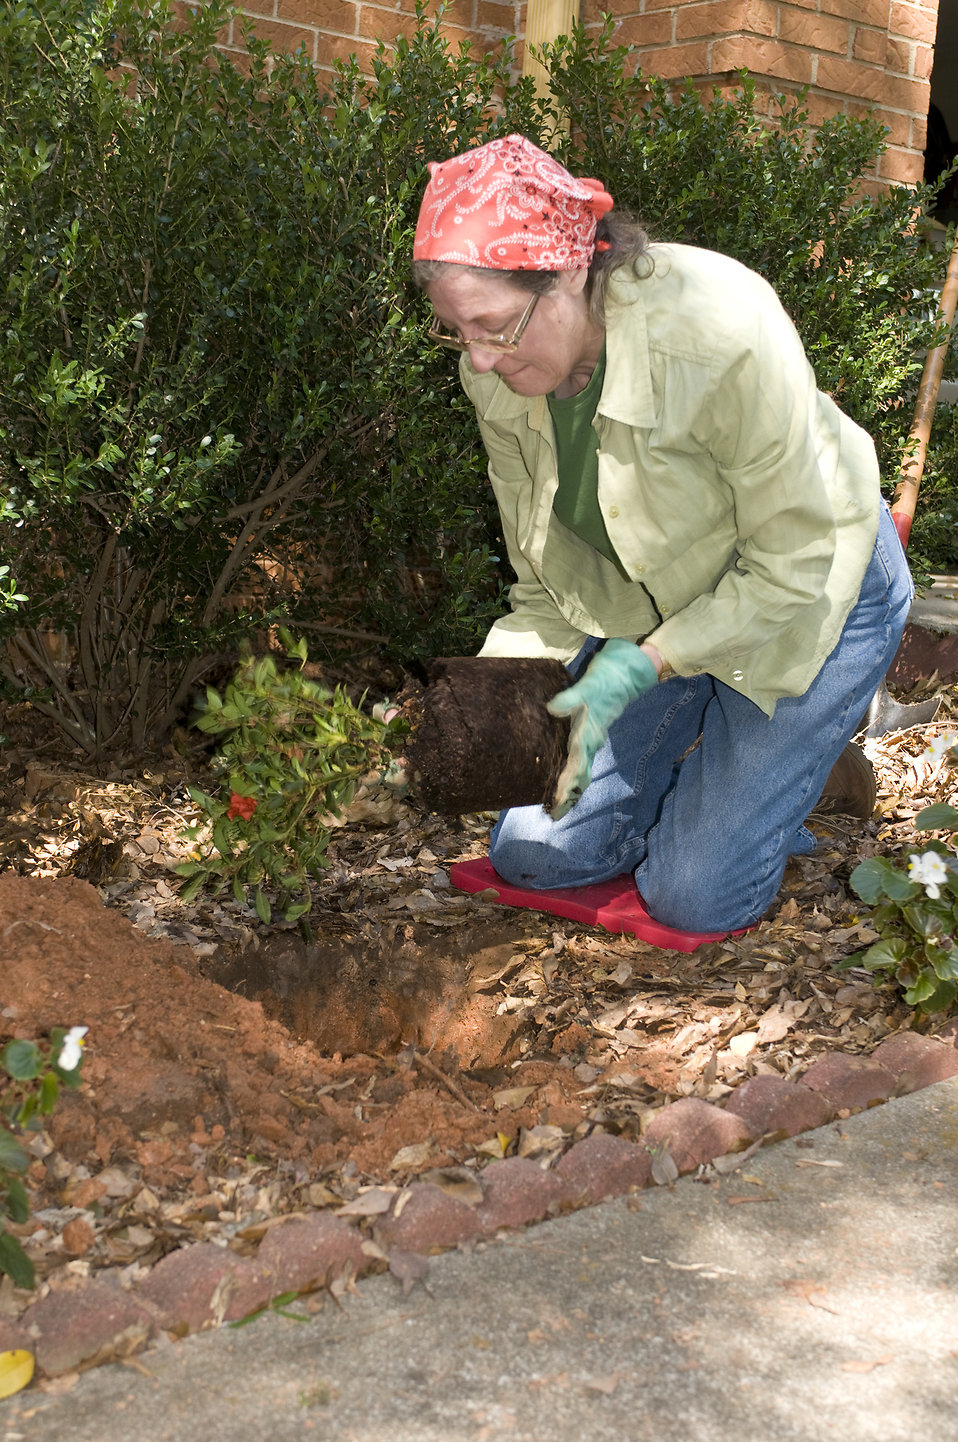 Garden Free Stock Photo A Woman Working In Her Garden